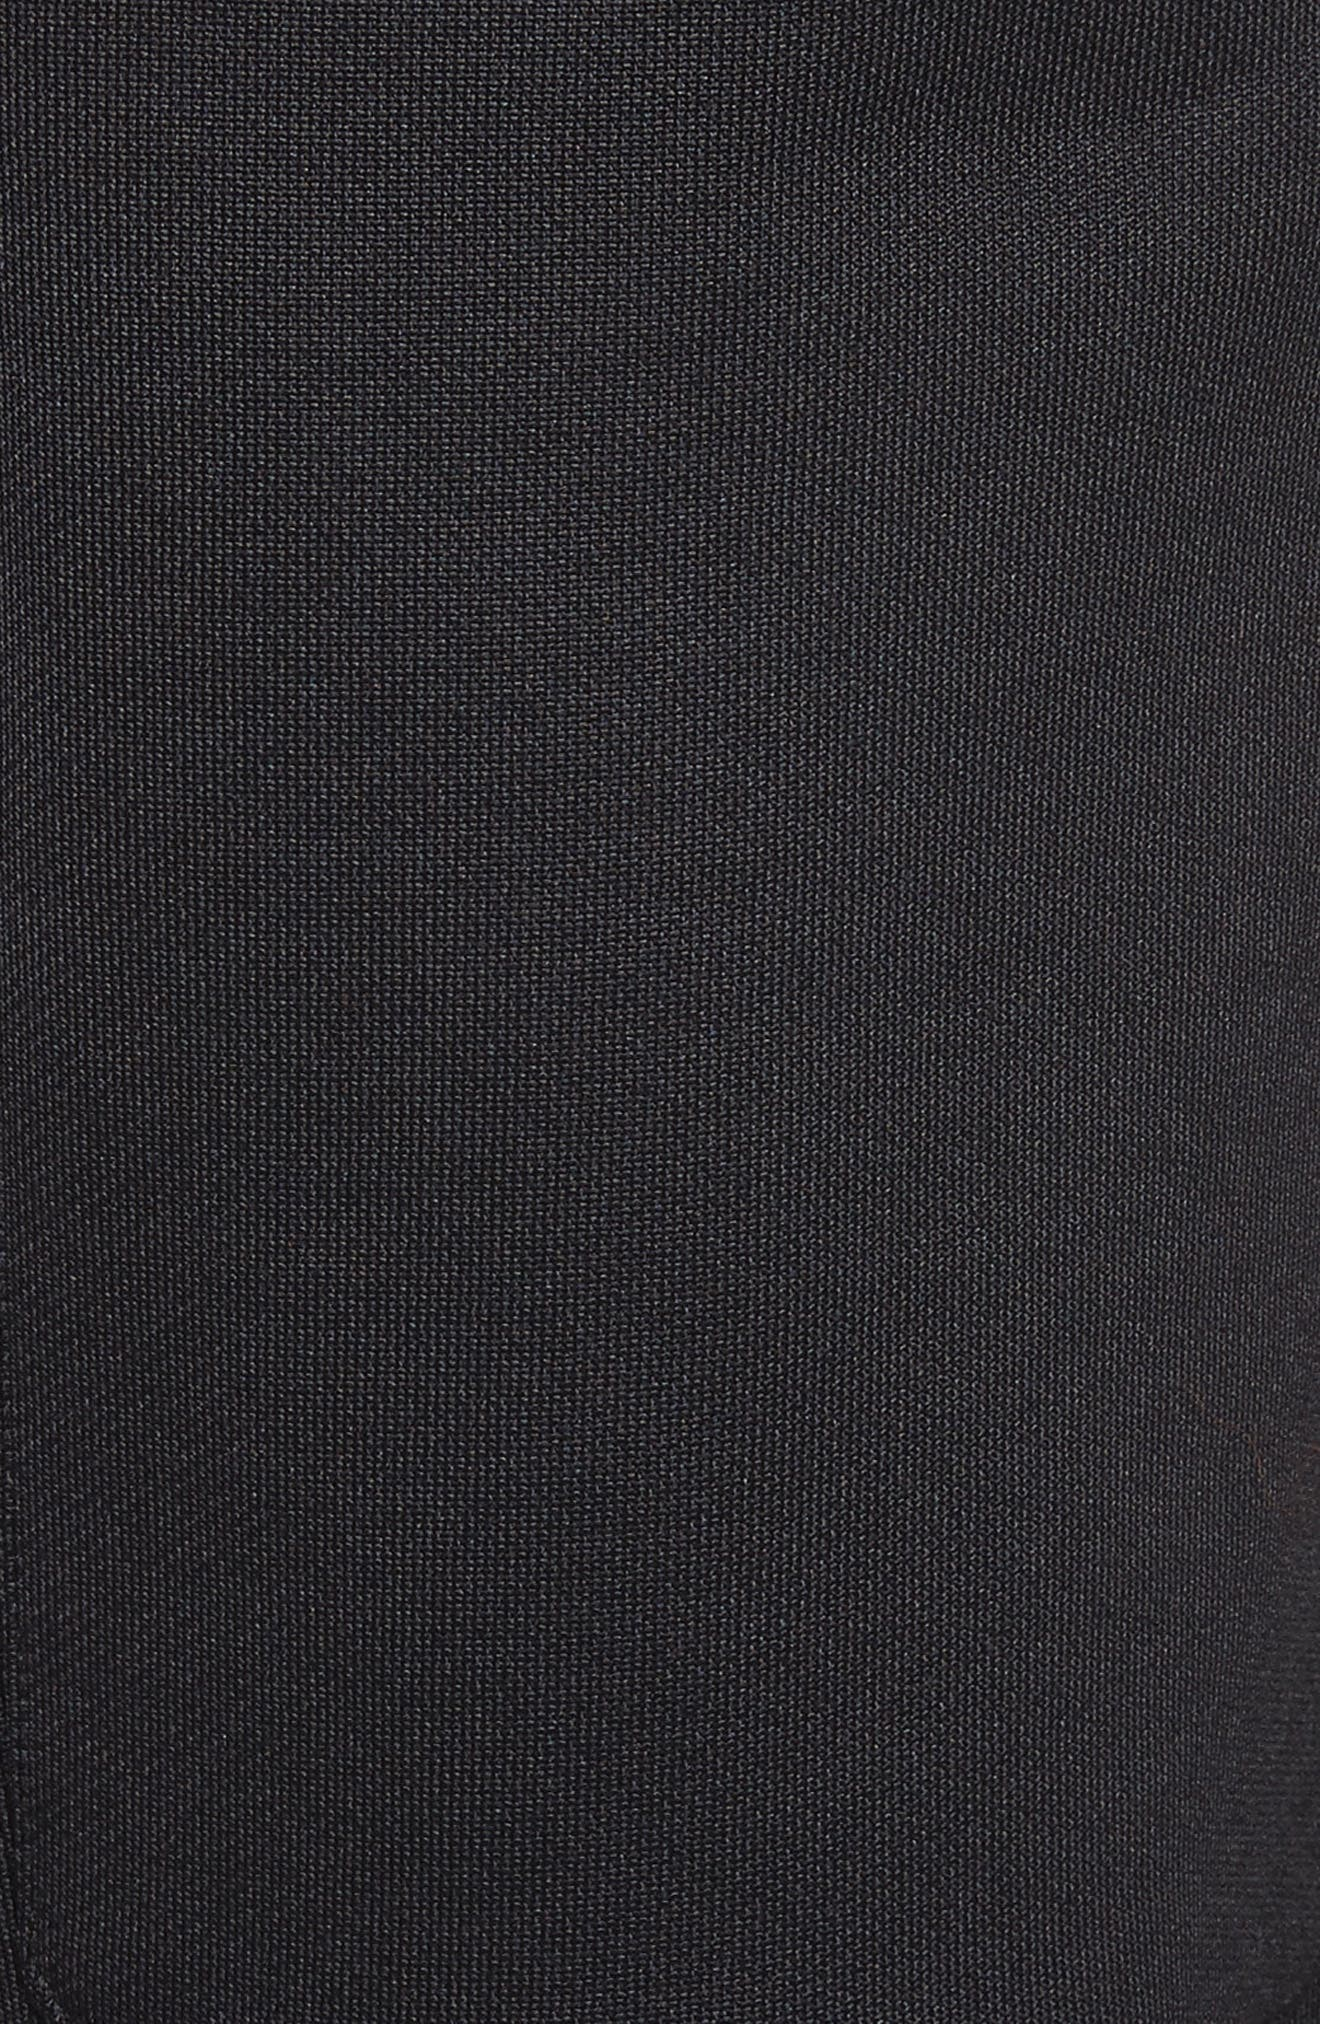 Marques'Almeida Tracksuit Wide Leg Fleece Shorts,                             Alternate thumbnail 5, color,                             001